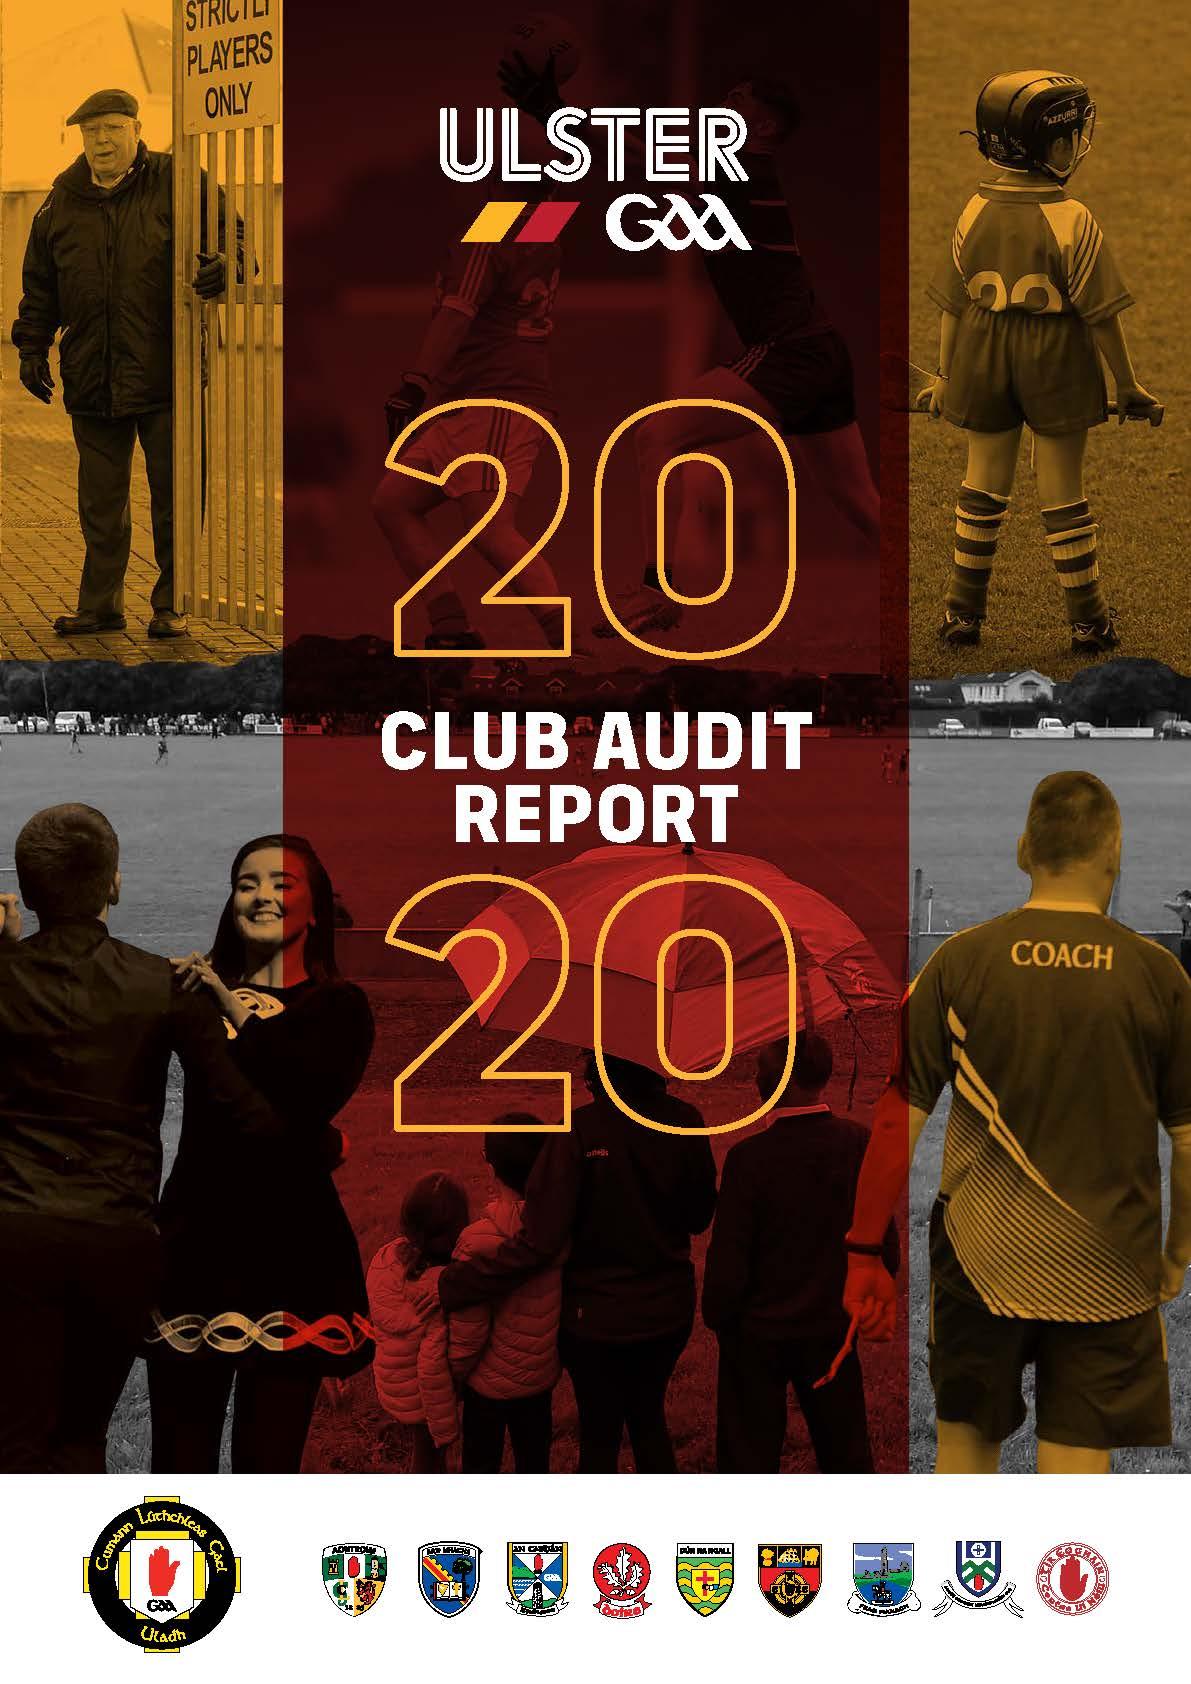 Ulster GAA release Club Audit Report 2020